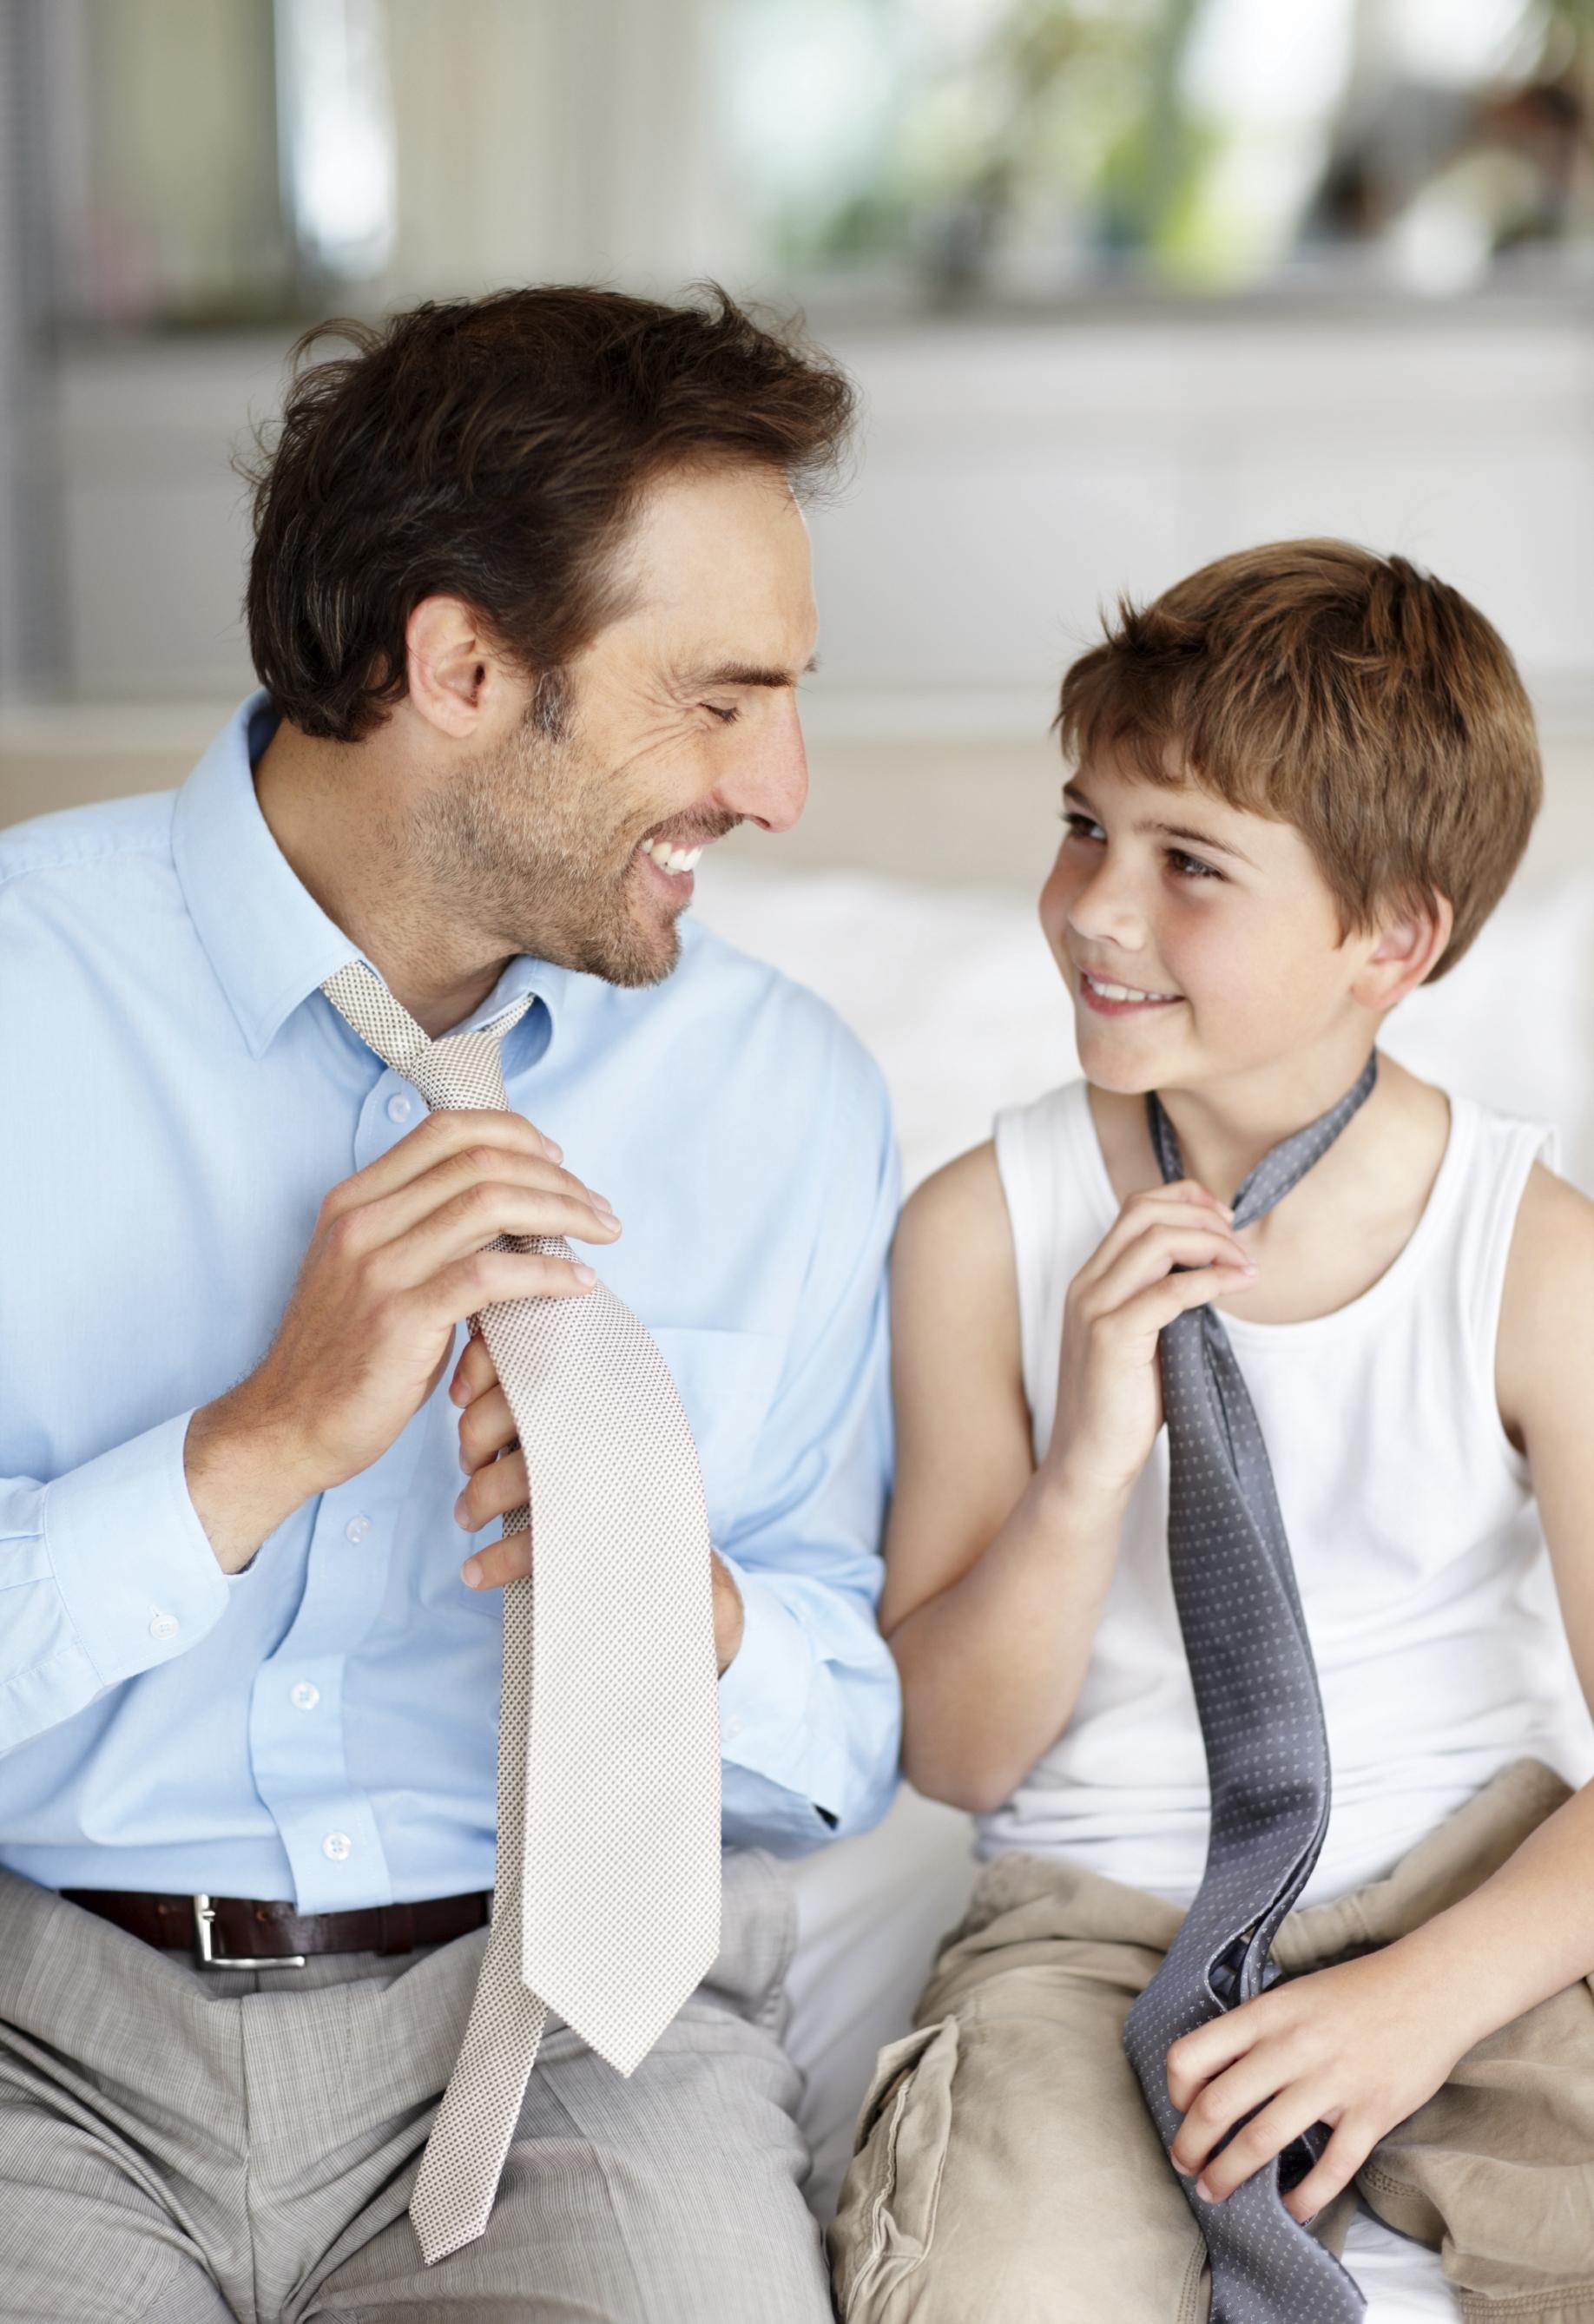 BLOG DM 6 Ways Mediation Can Ease the Divorce Process for Men PHOTO